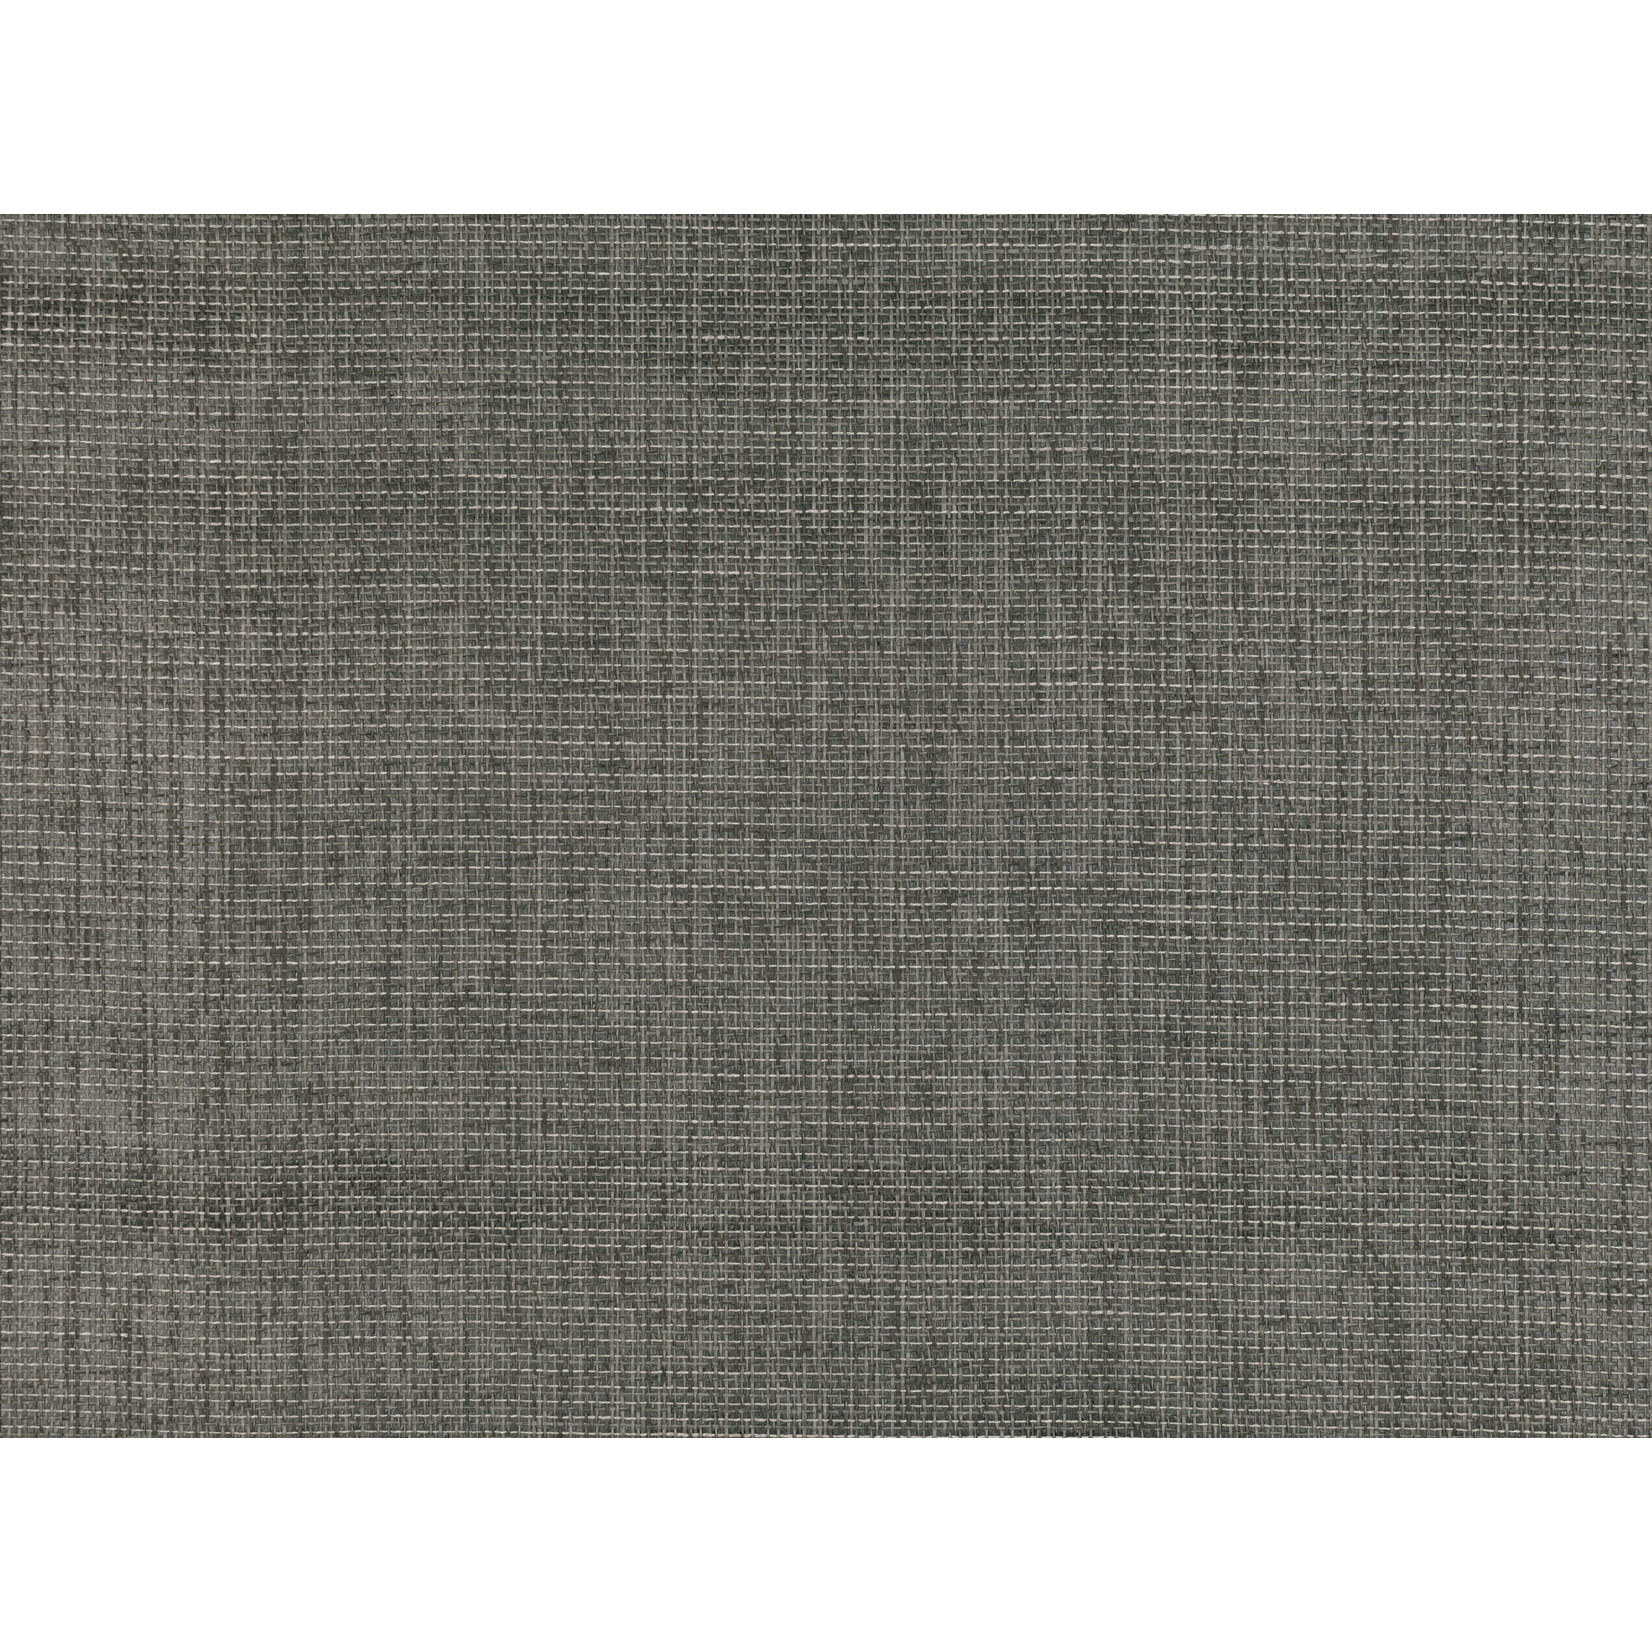 Mark Alexander Paperweave Handwoven Wallcoverings | Kami Anthracite